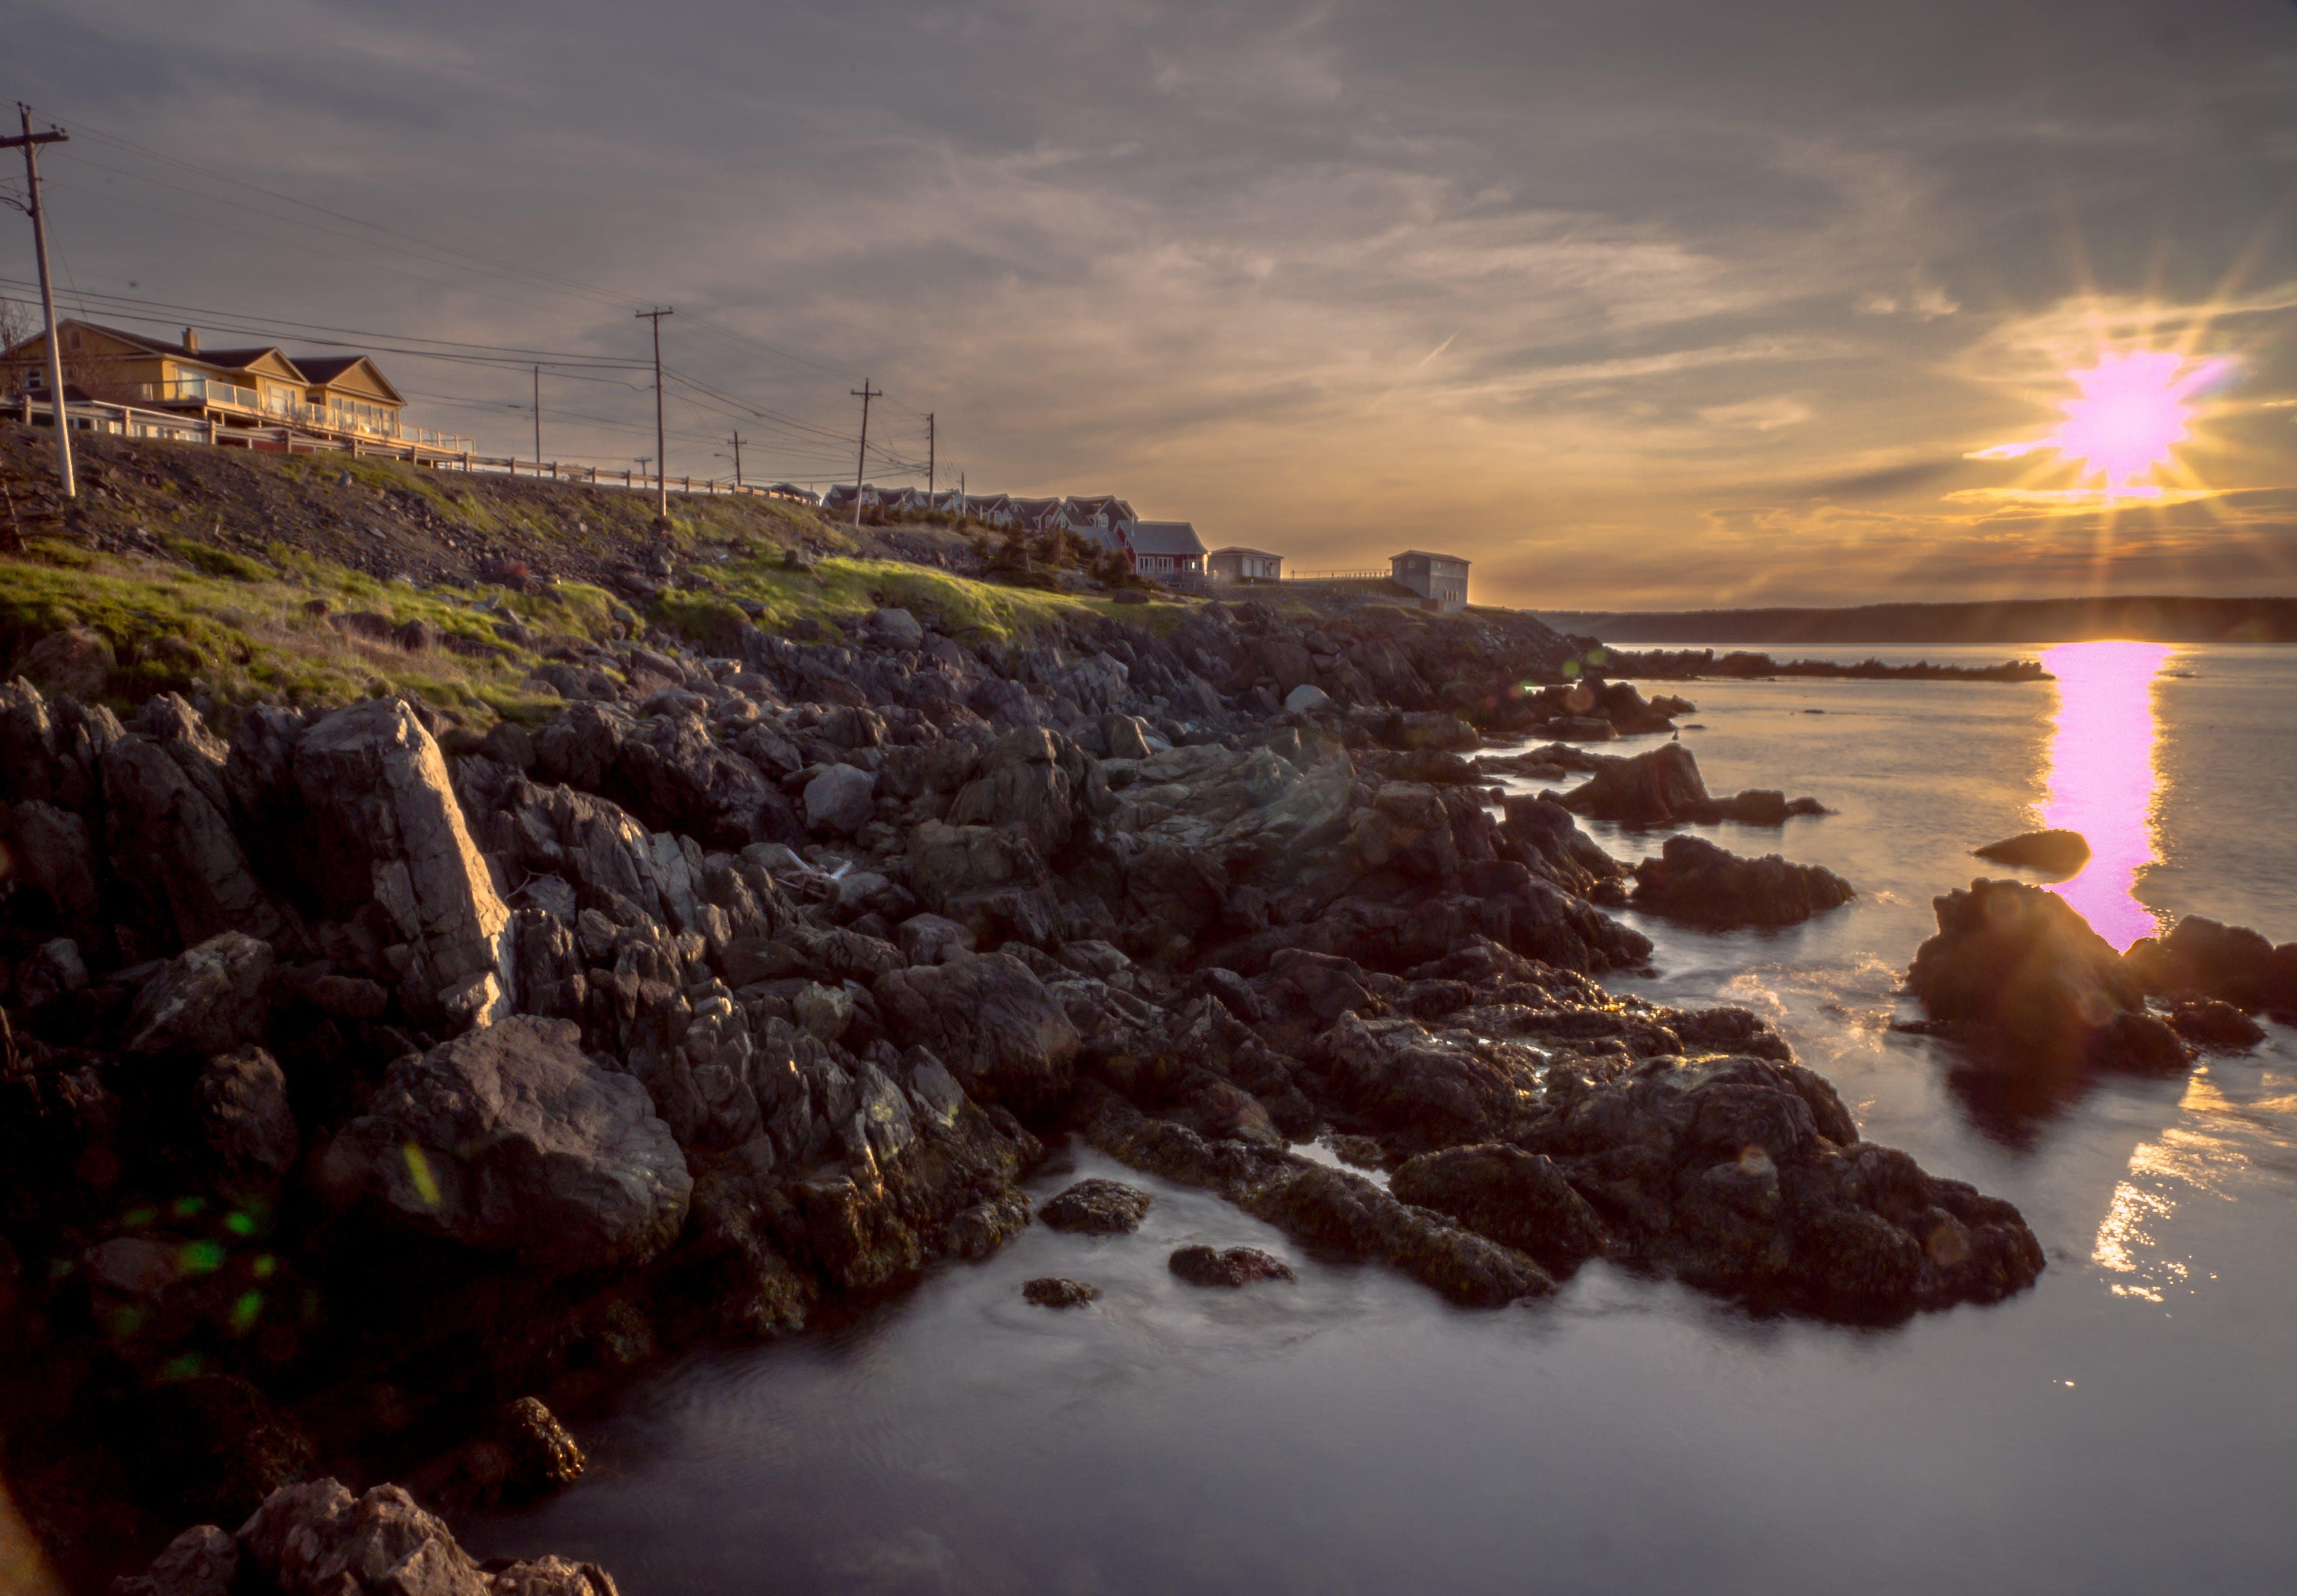 Free stock photo of coast, newfoundland, portgual cove, bell island